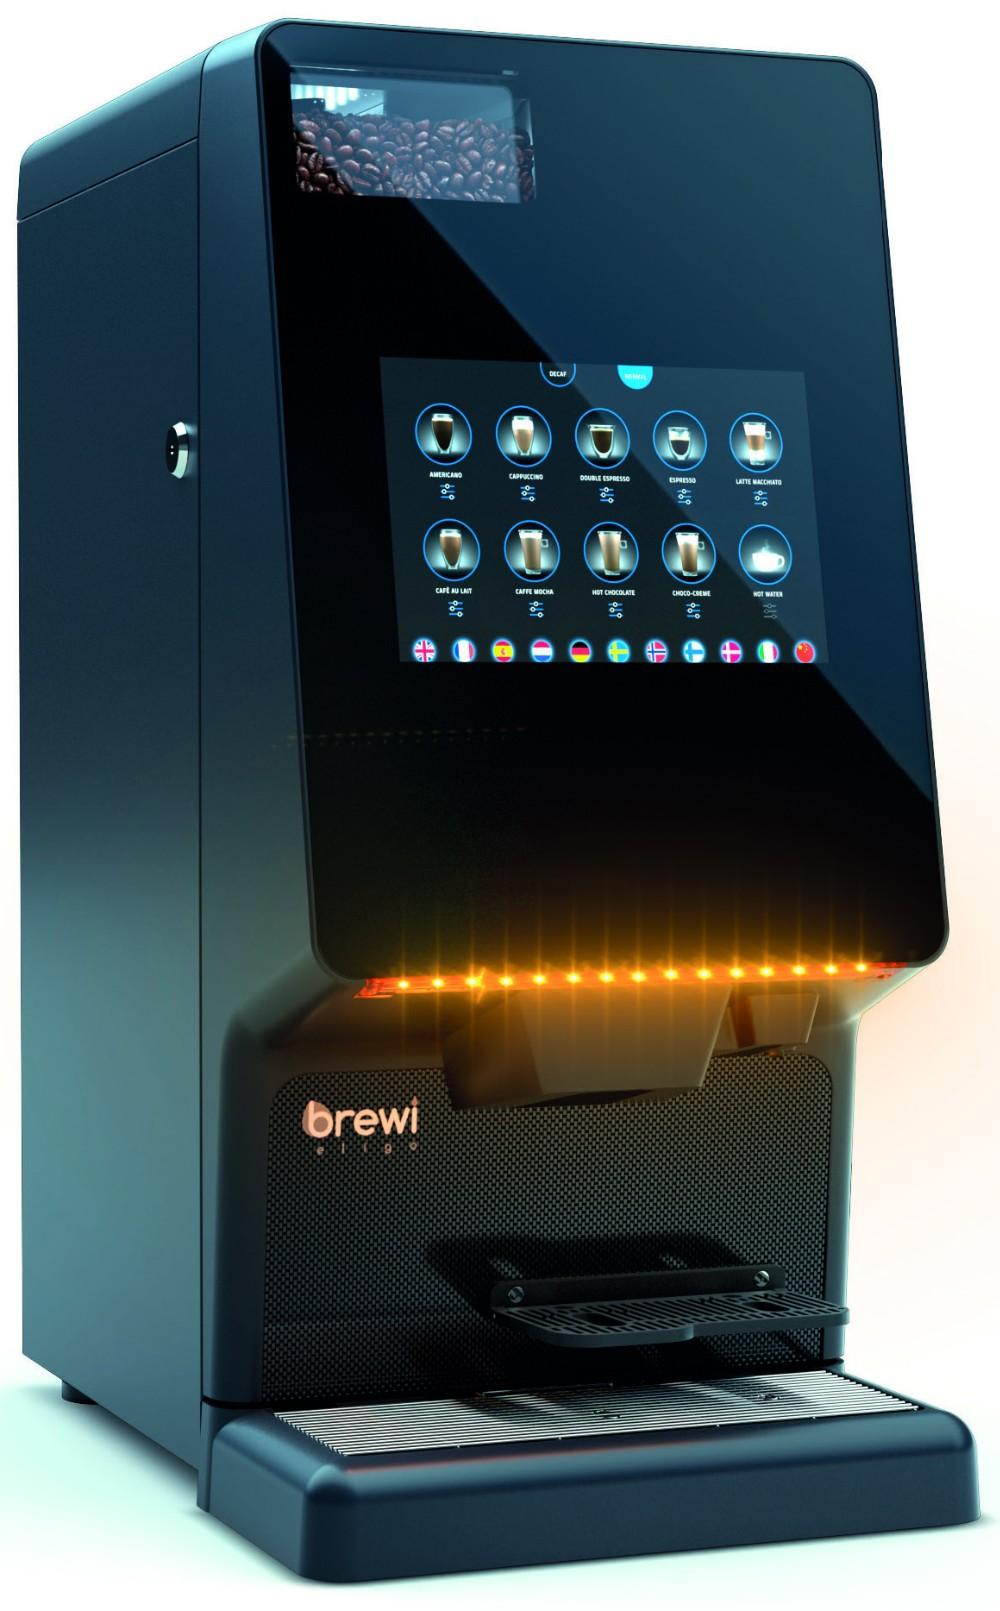 Sapoe 2t32b Brewi Eligo Automatic Dynamic Touch Screen